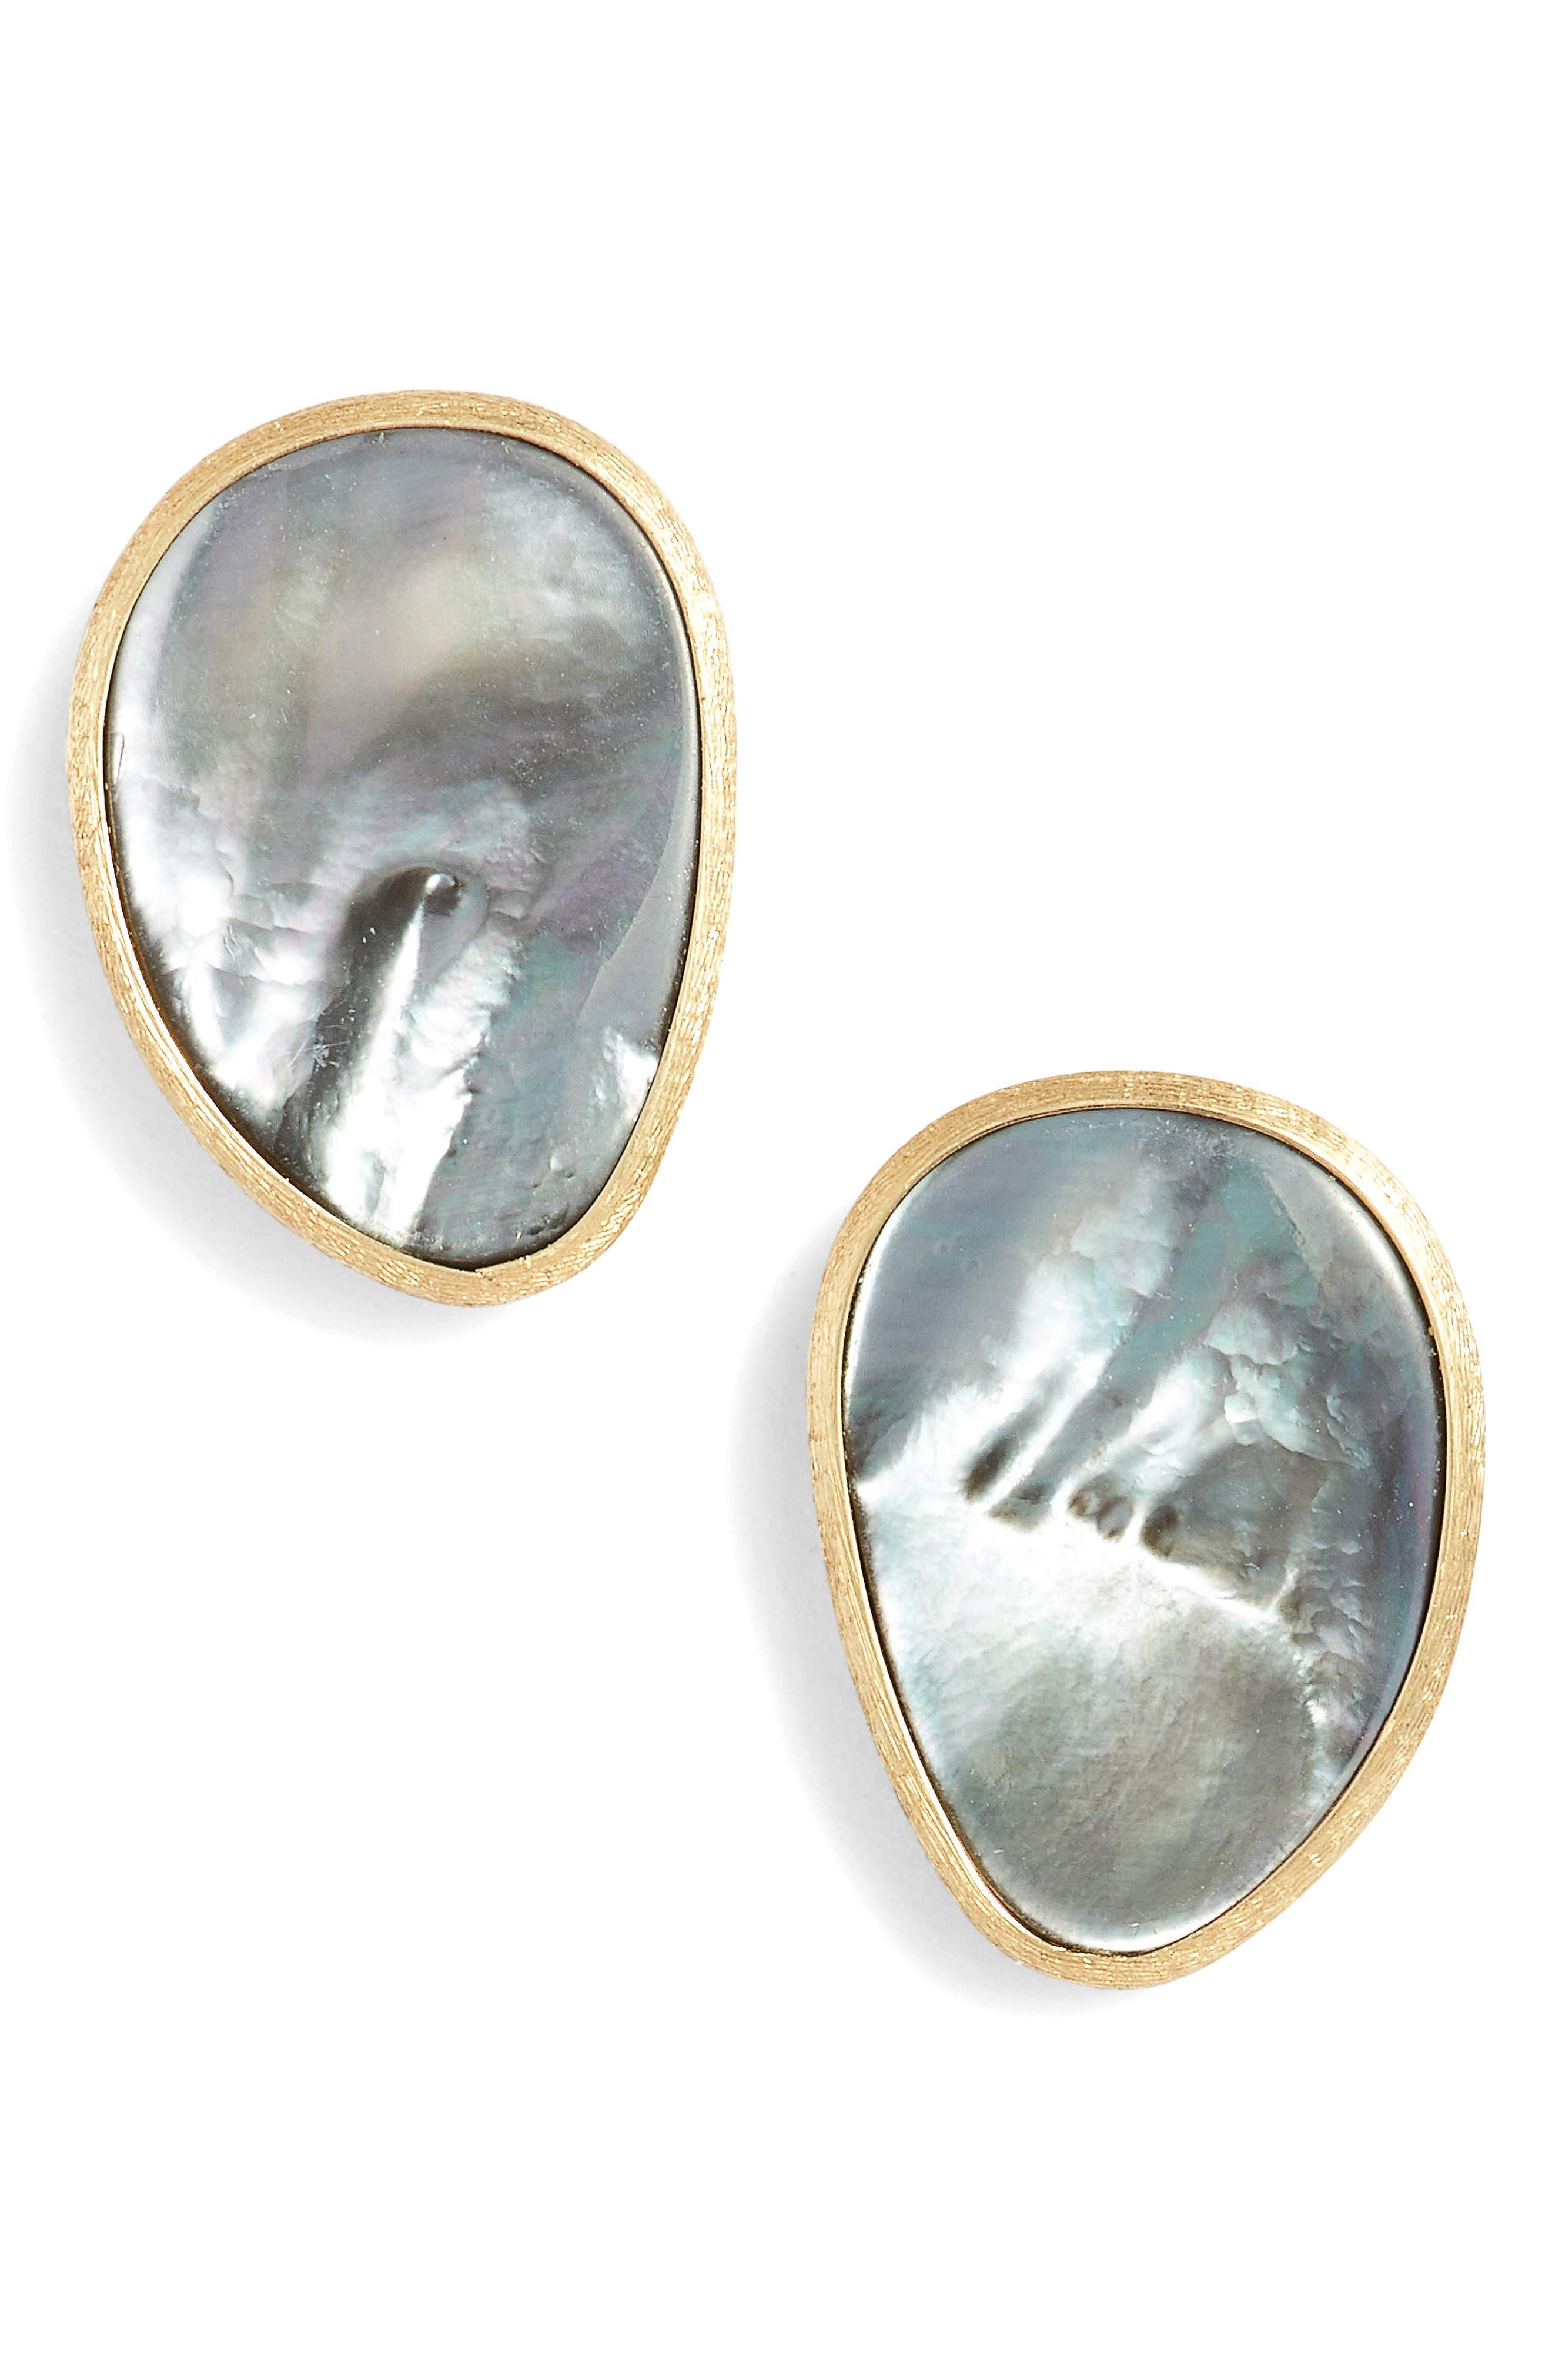 Lunaria Pearl Stud Earrings,                             Main thumbnail 1, color,                             GREY MOTHER OF PEARL